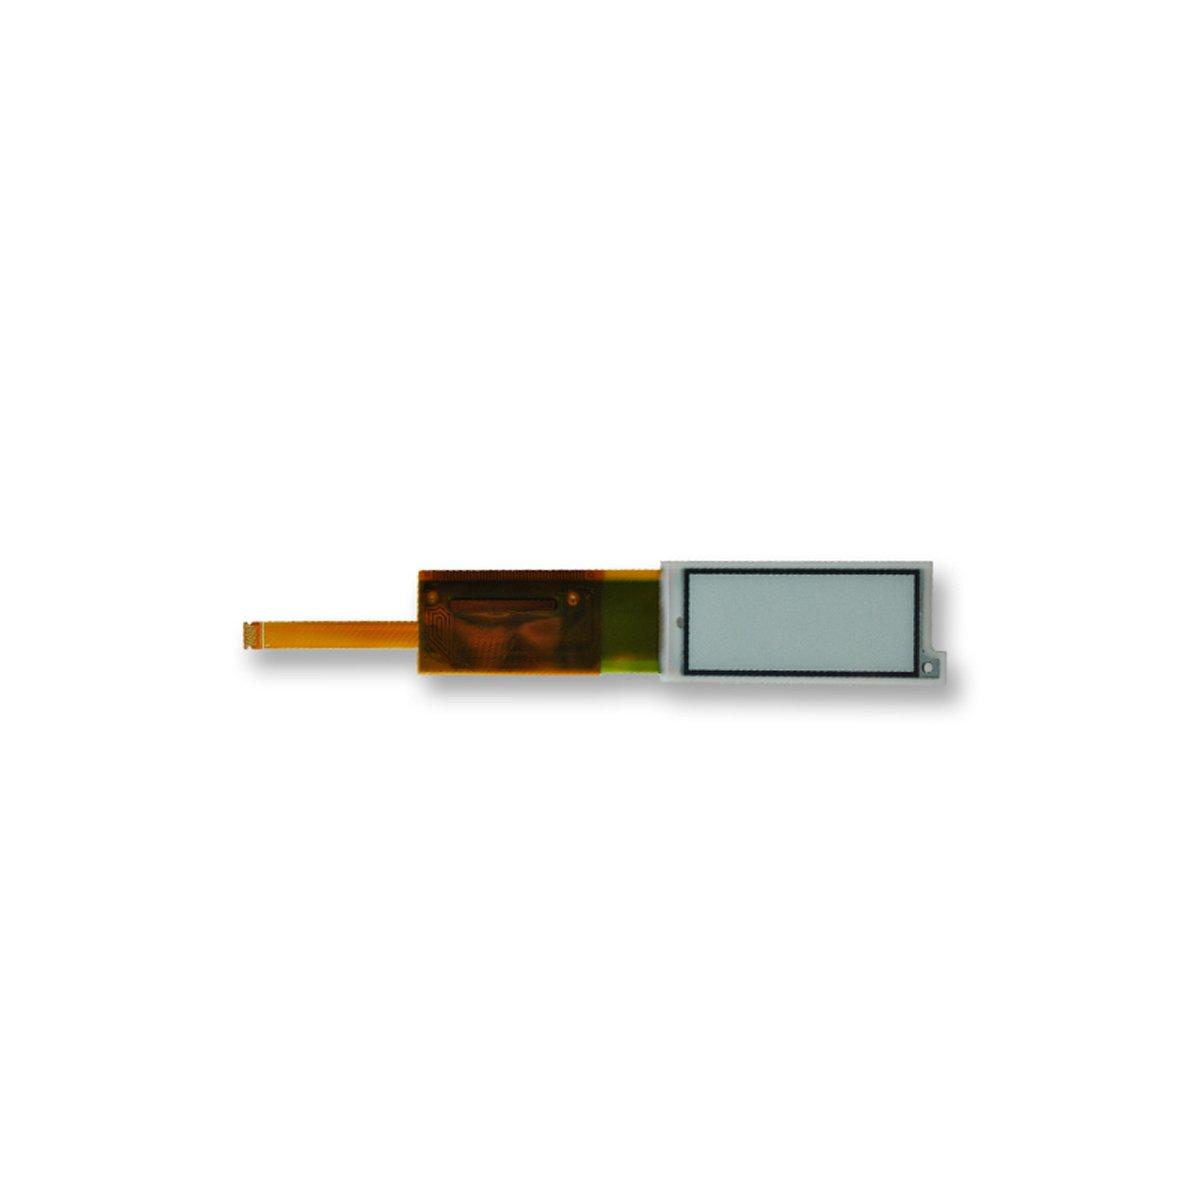 GooDisplay E-Paper Screen 1.43 Inch Eink Display Flexible Dot Matrix Electronic Paper Display Panel